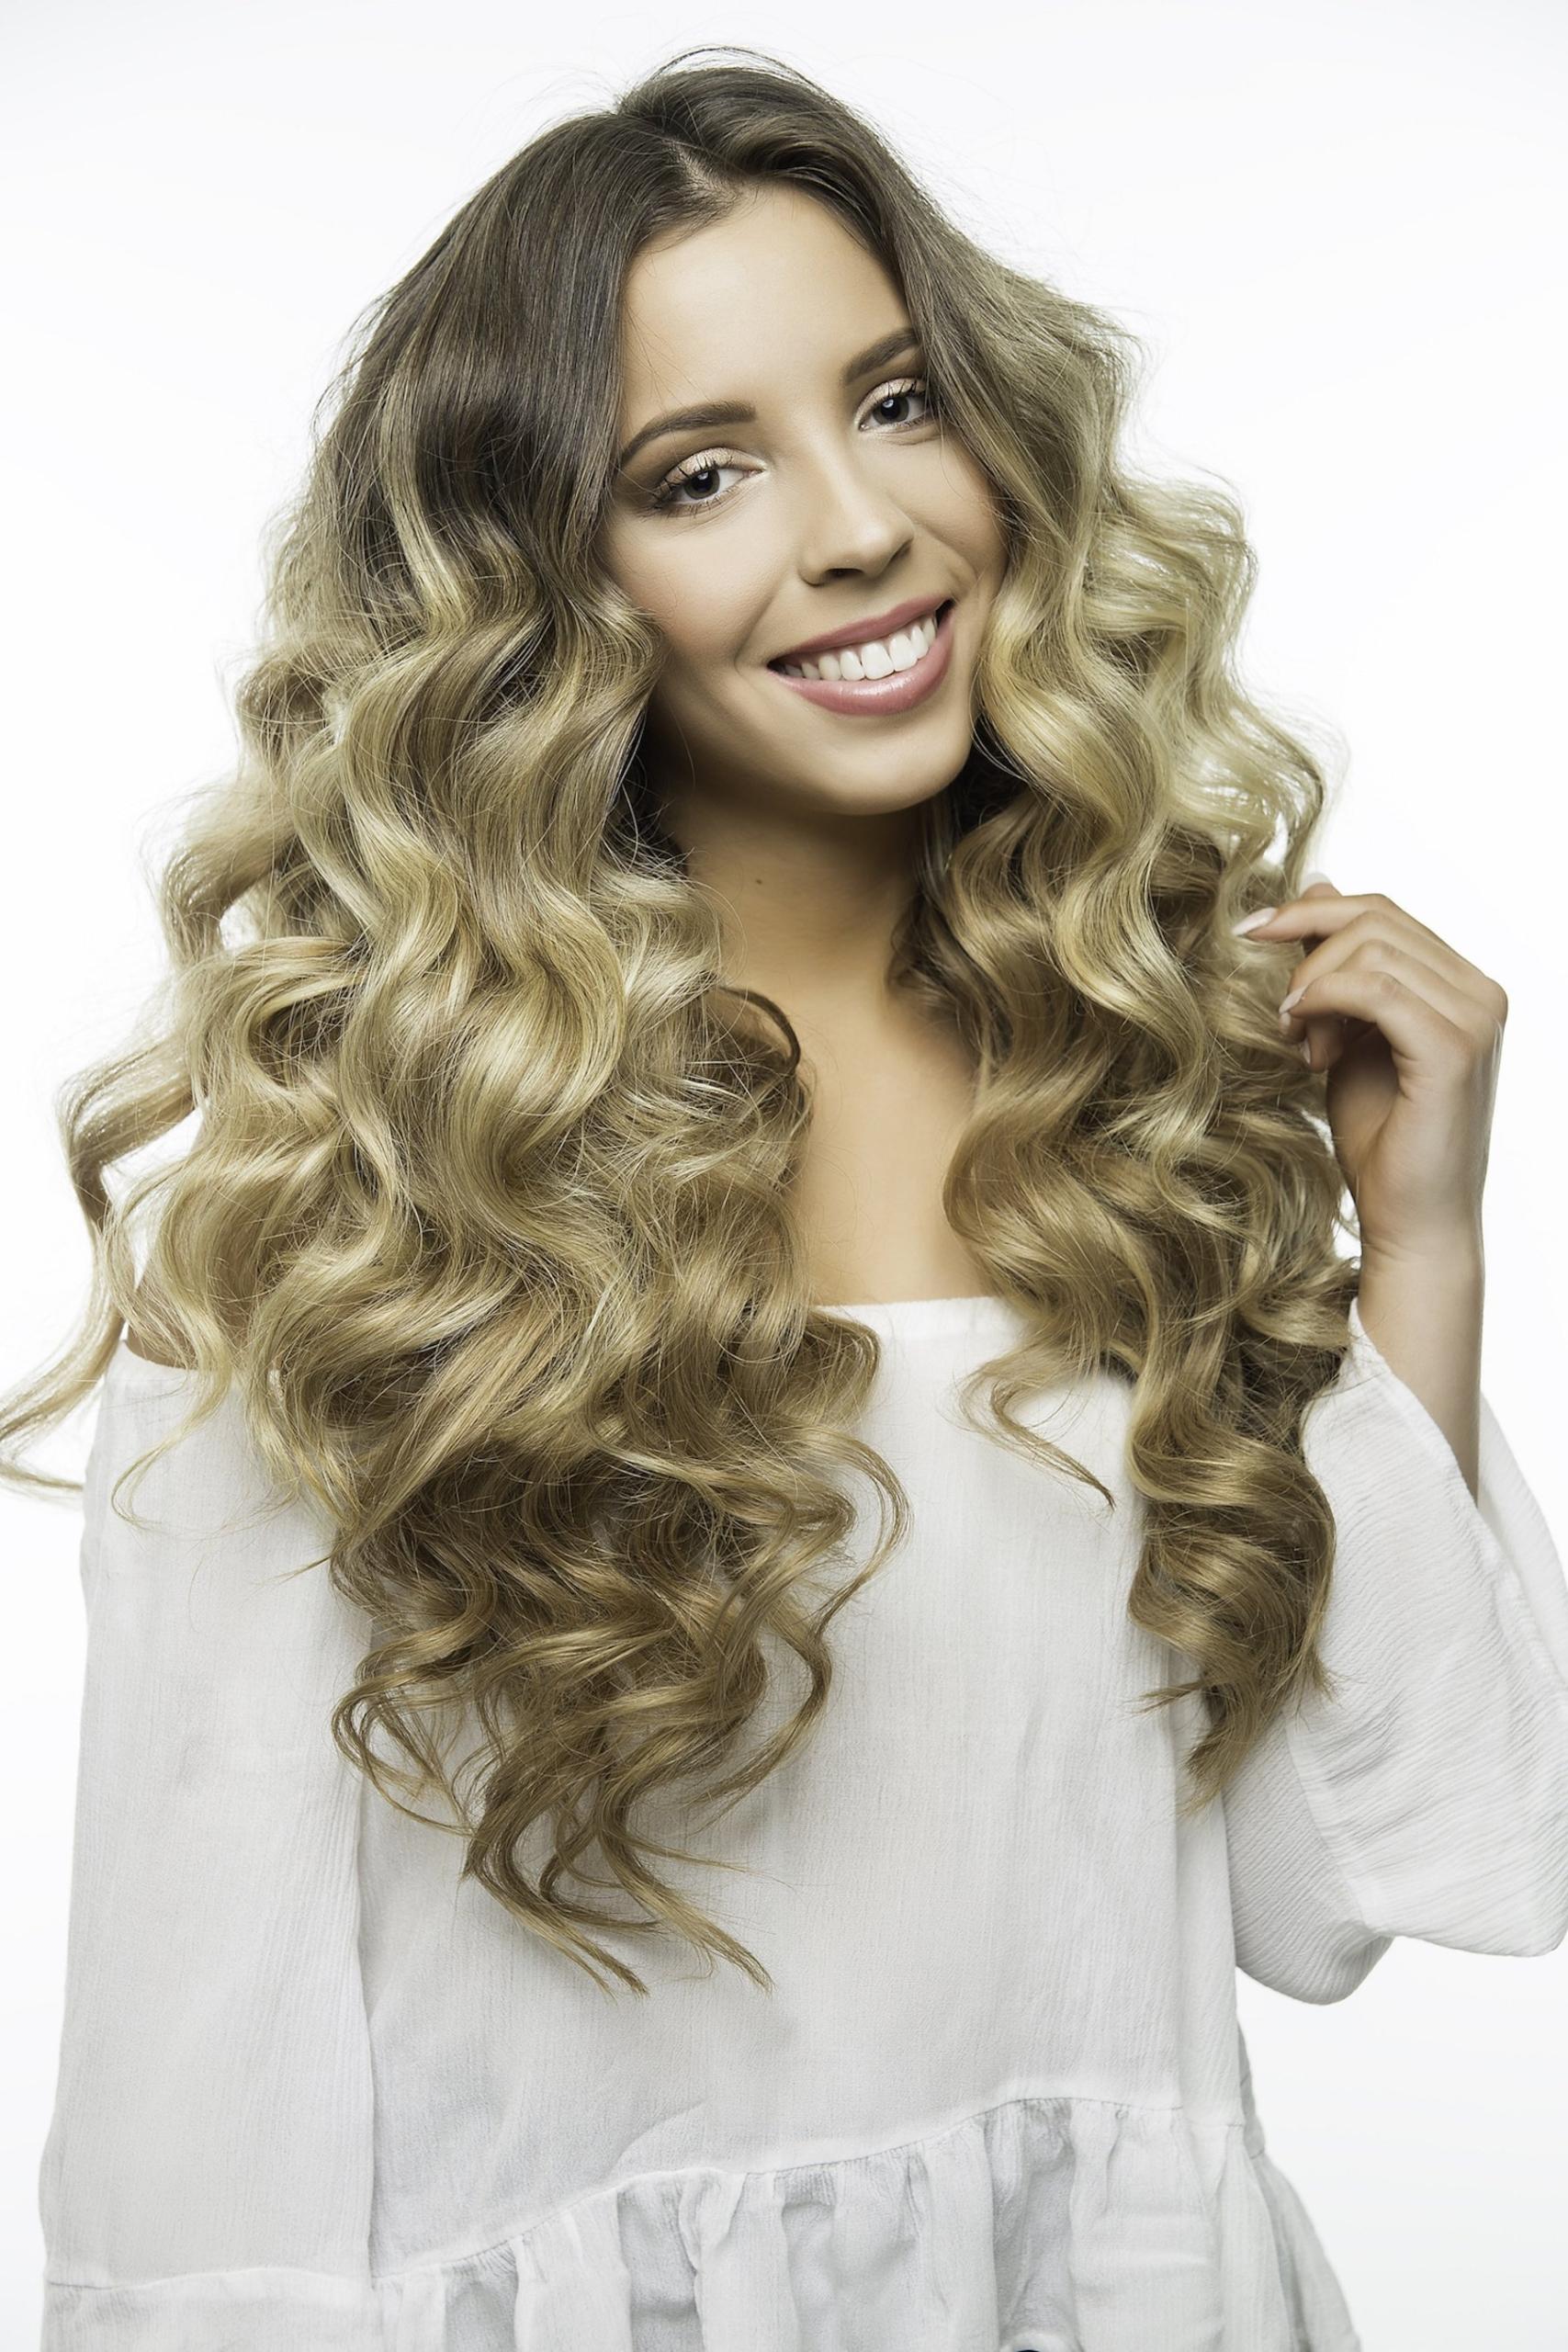 Stylish Women's Styles – Why Choose Bombay Hair Wigs